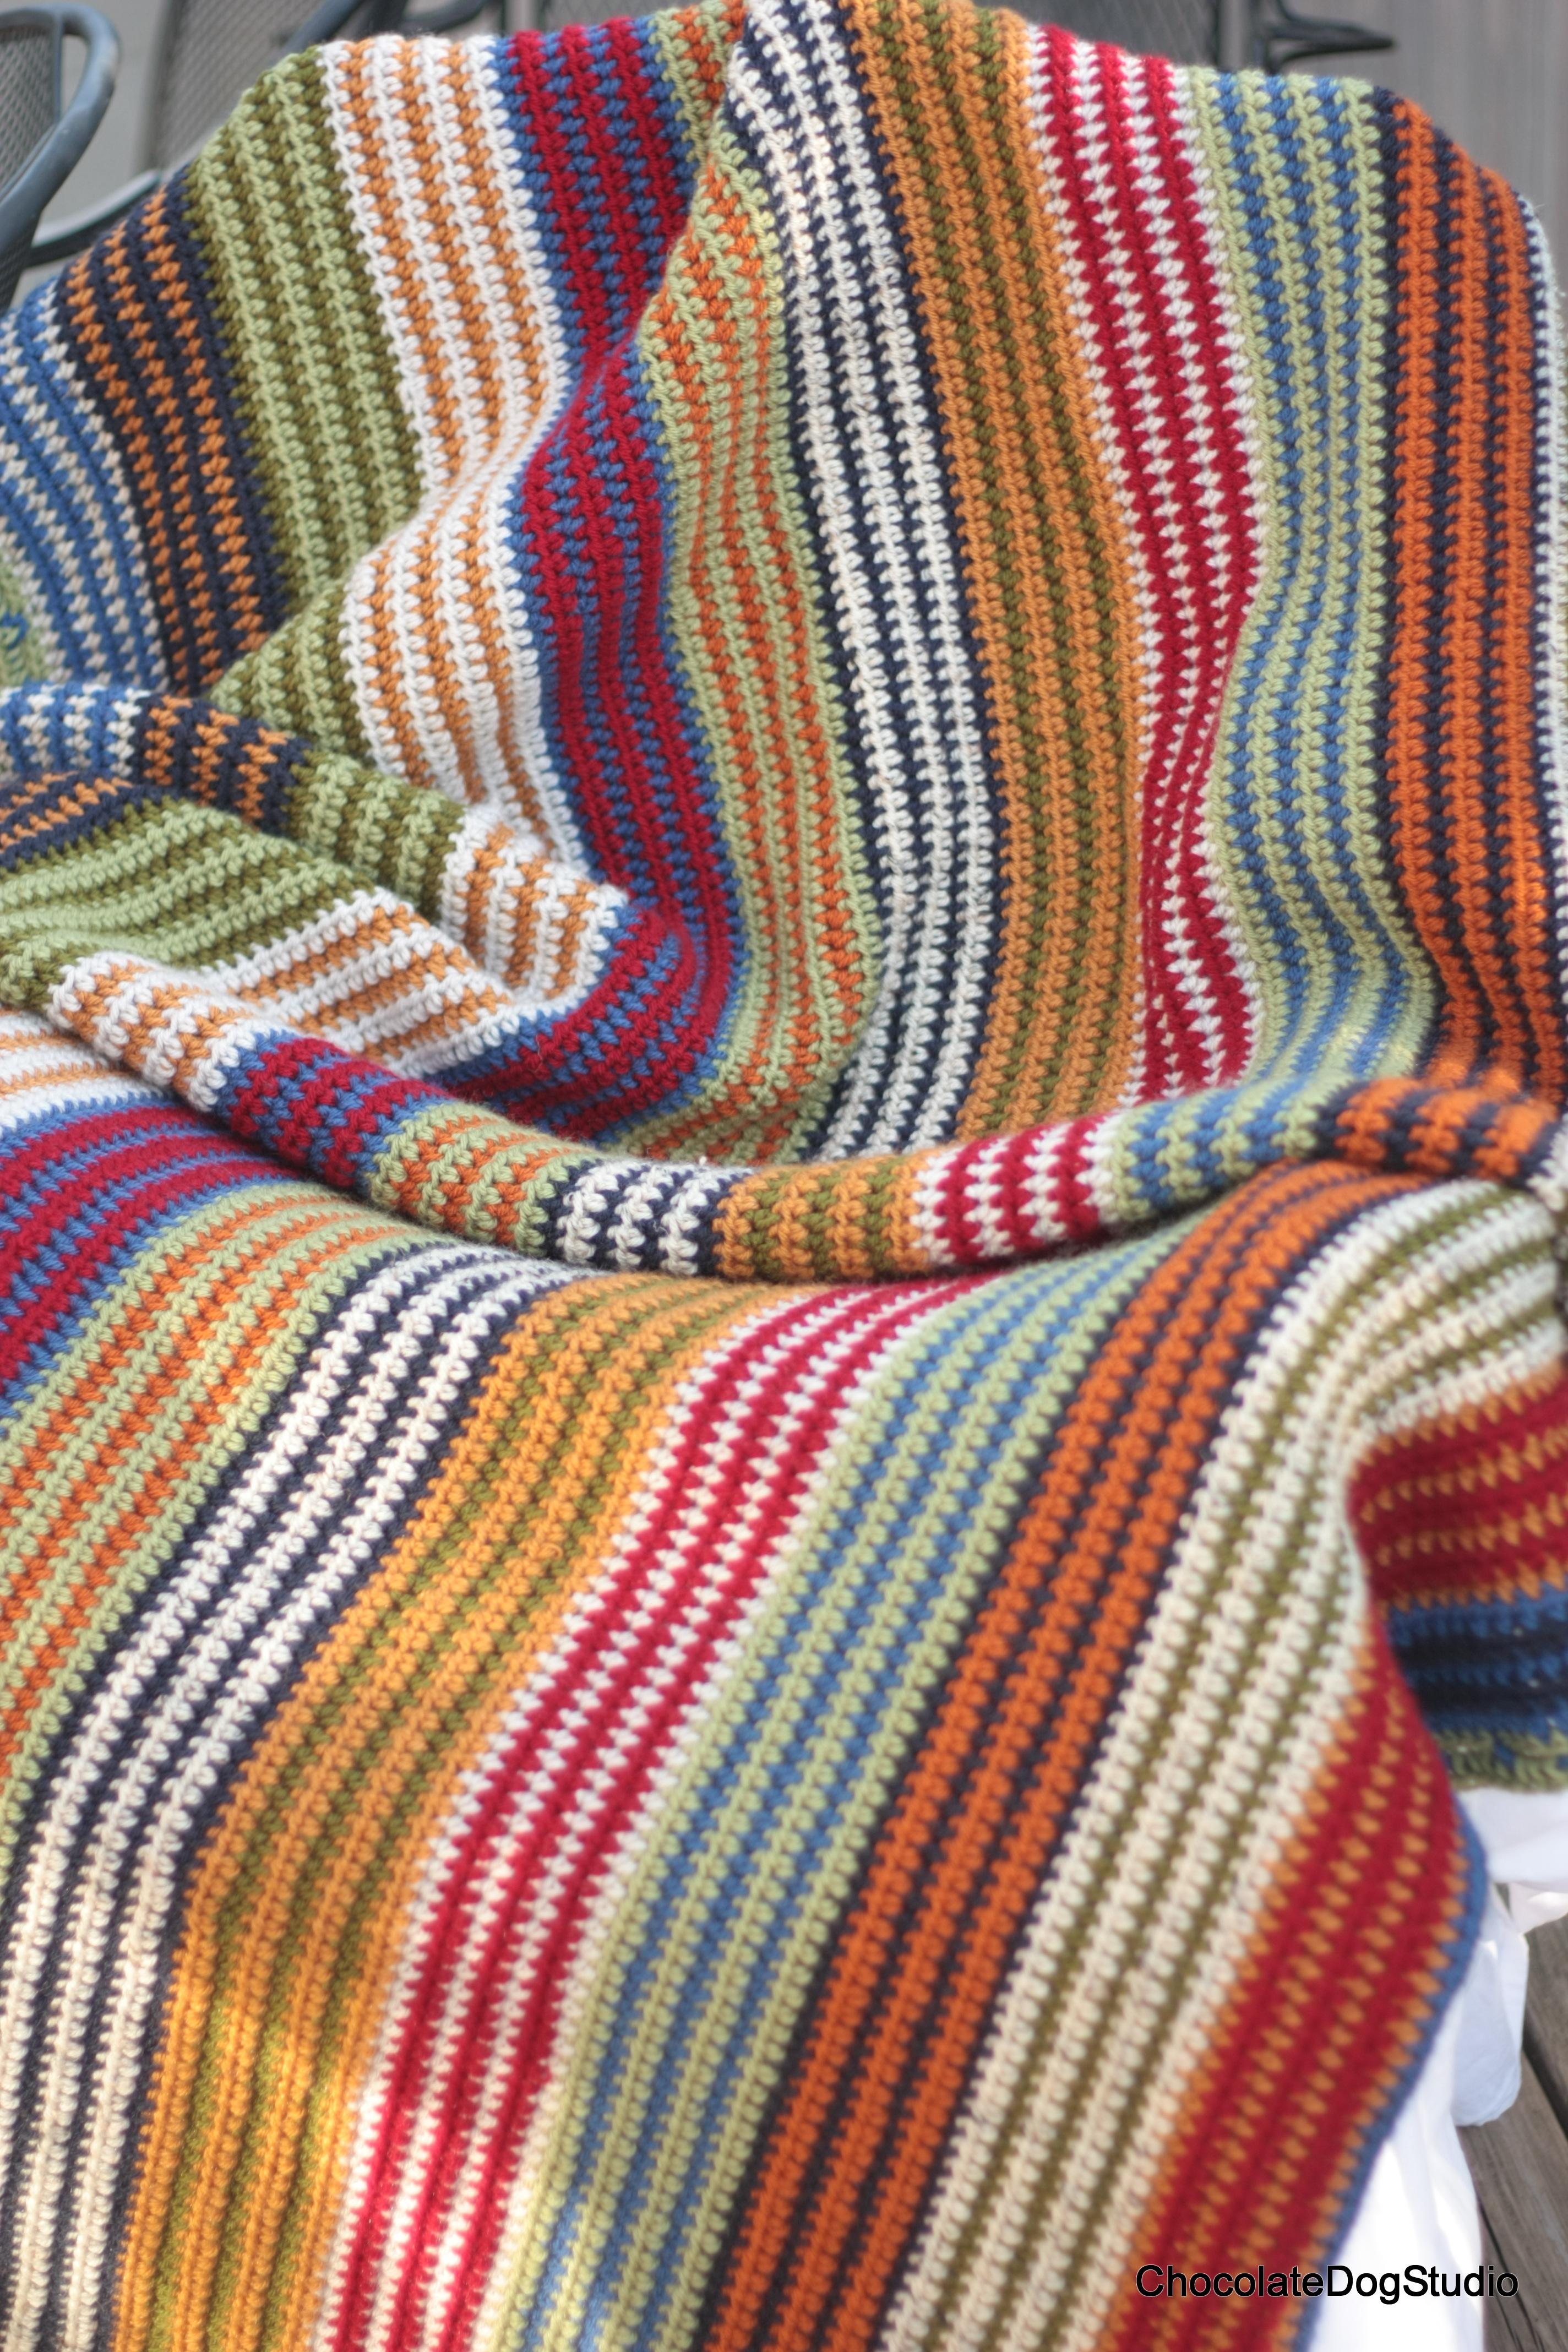 Yikes Stripes Blanket Archives Chocolate Dog Studio